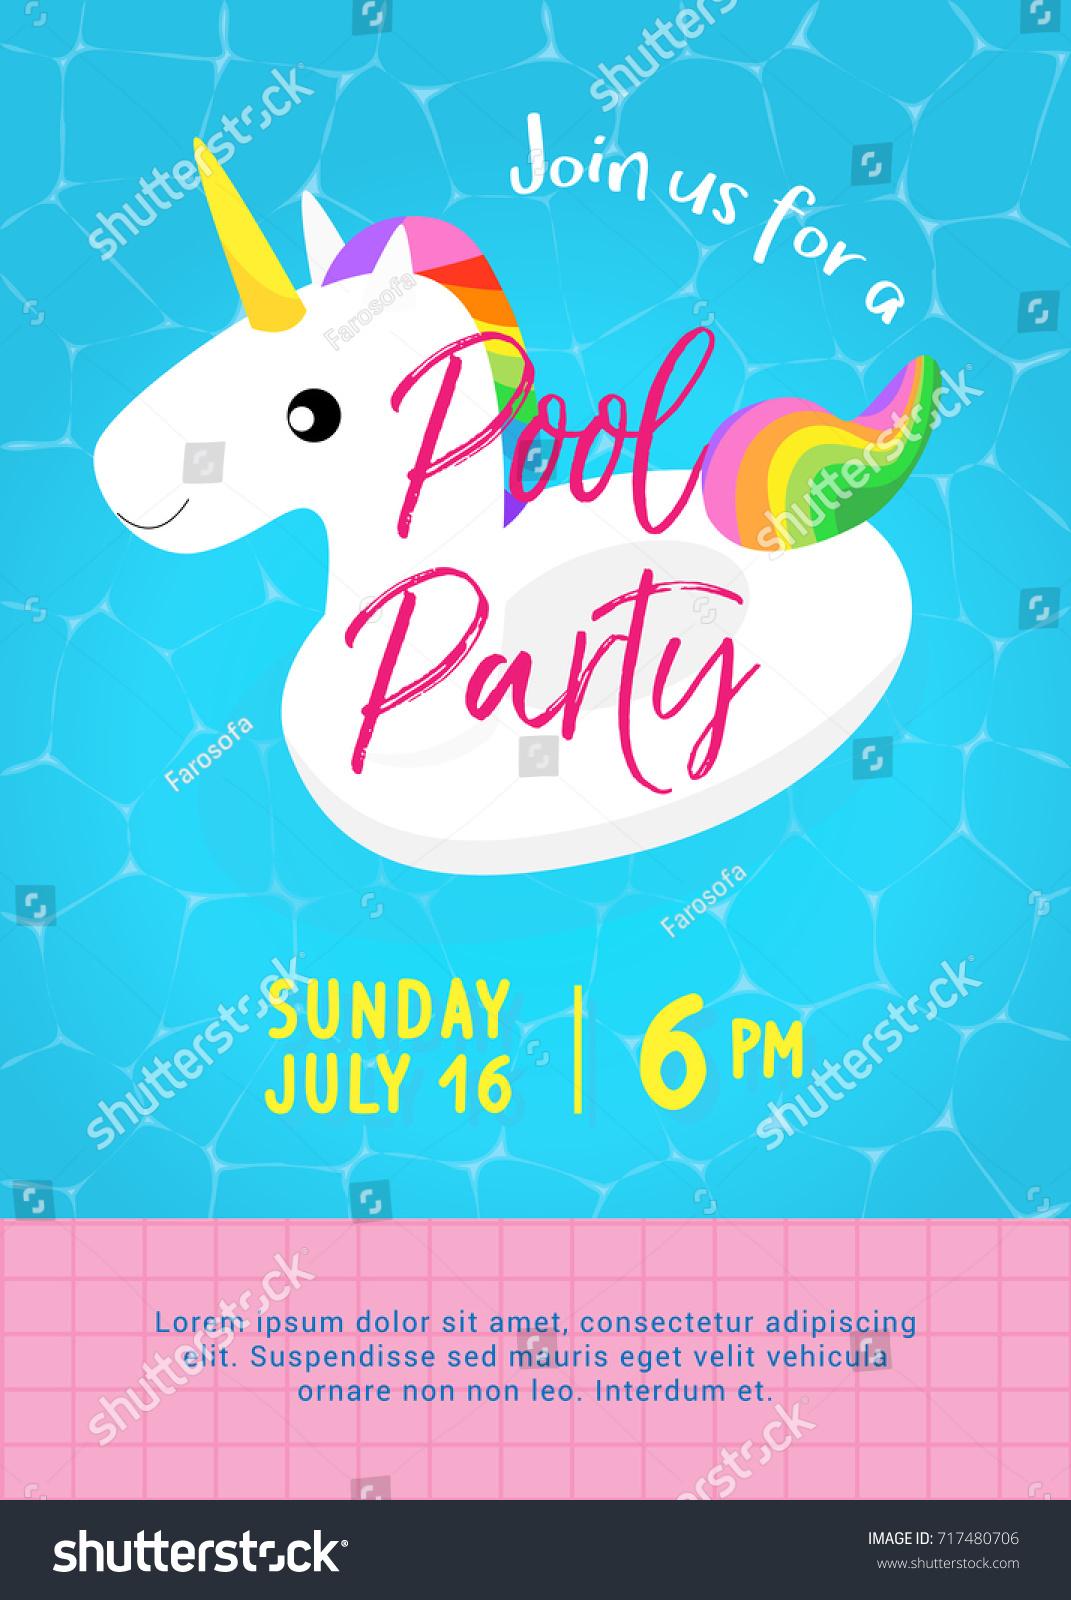 Pool Party Invitation Vector Illustration Swimming Stock Vector ...